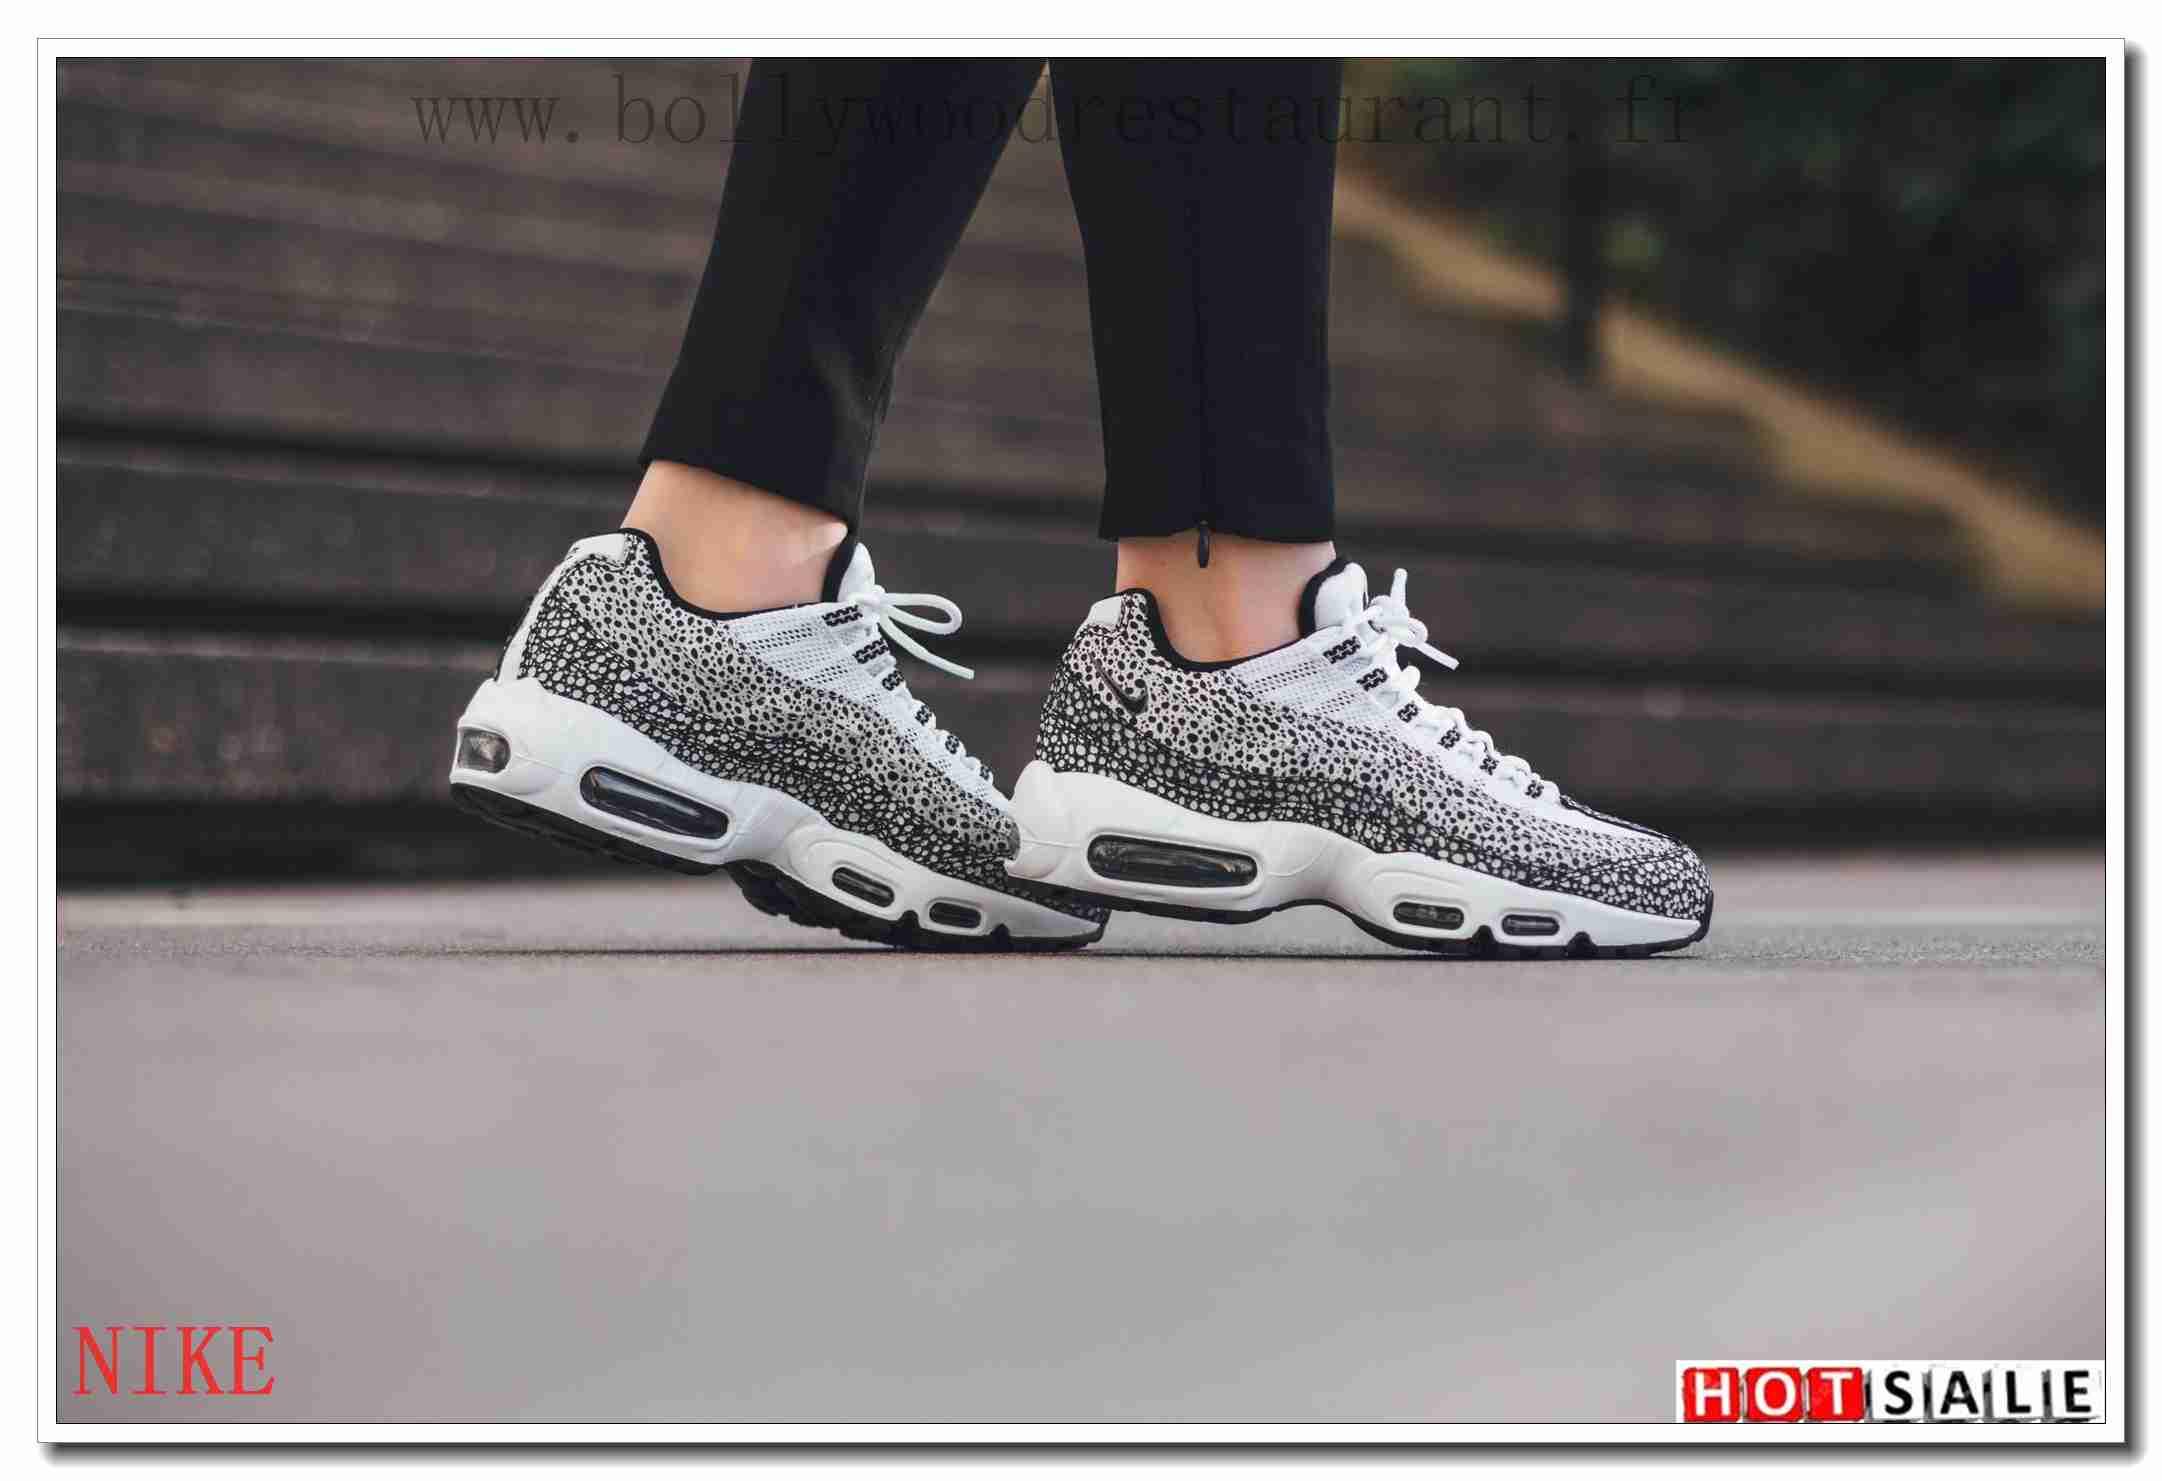 EO6634 La Mode 2018 Nouveau style Nike Air Max 95 - Femme Chaussures - Promotions Vente - H.K.Y.&958 - Taille : 36~39